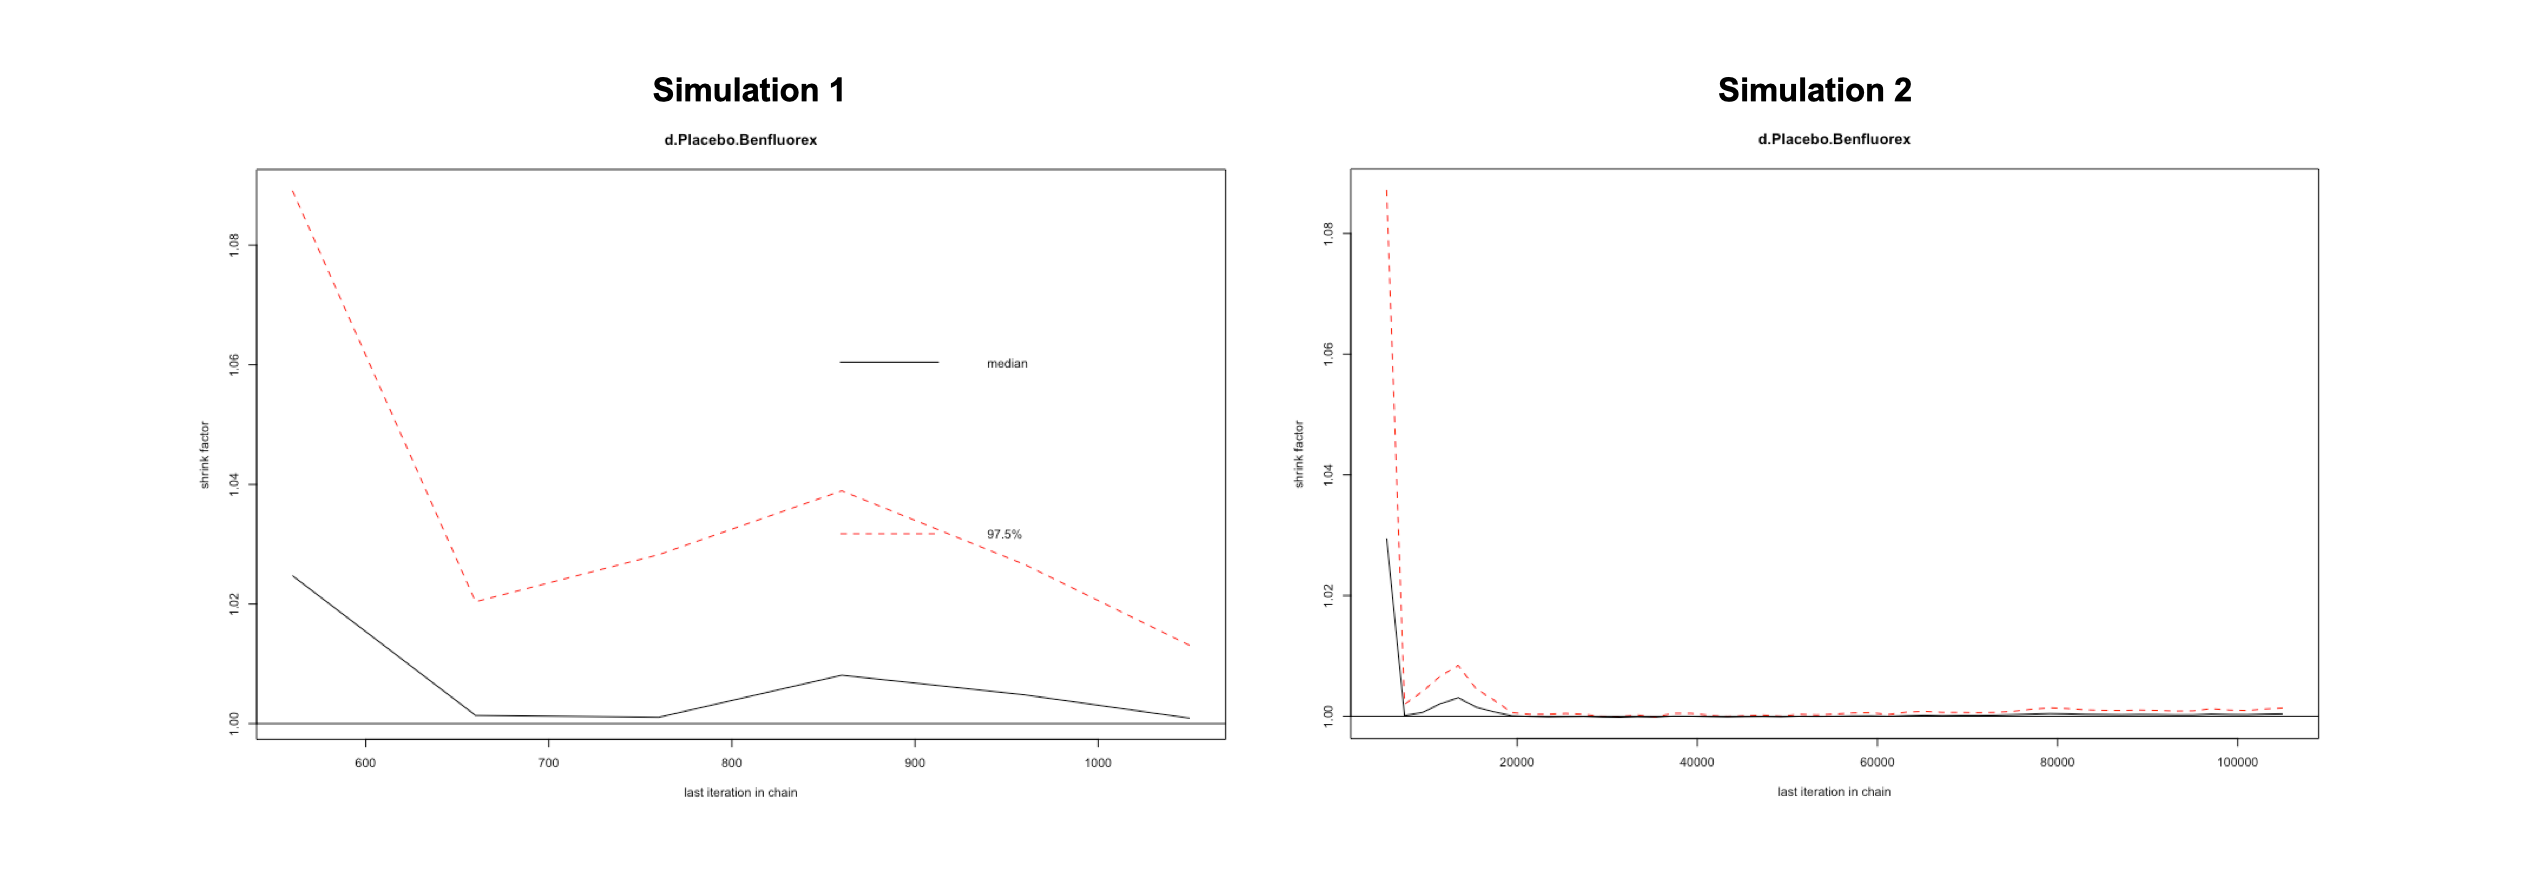 11 2 Bayesian Network Meta-Analysis | Doing Meta-Analysis in R